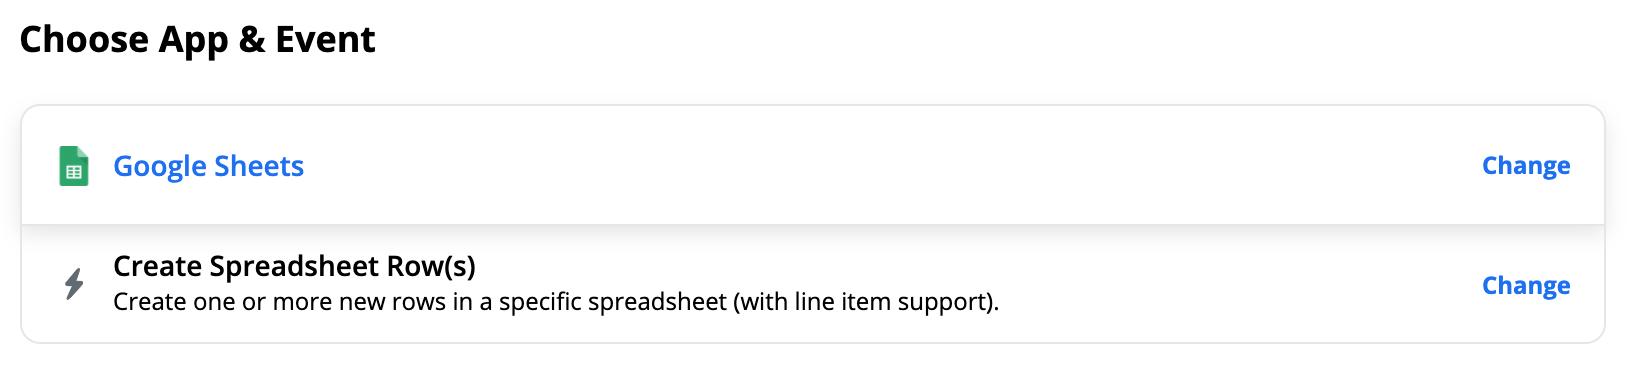 Google Sheet Create Spreadsheet rows